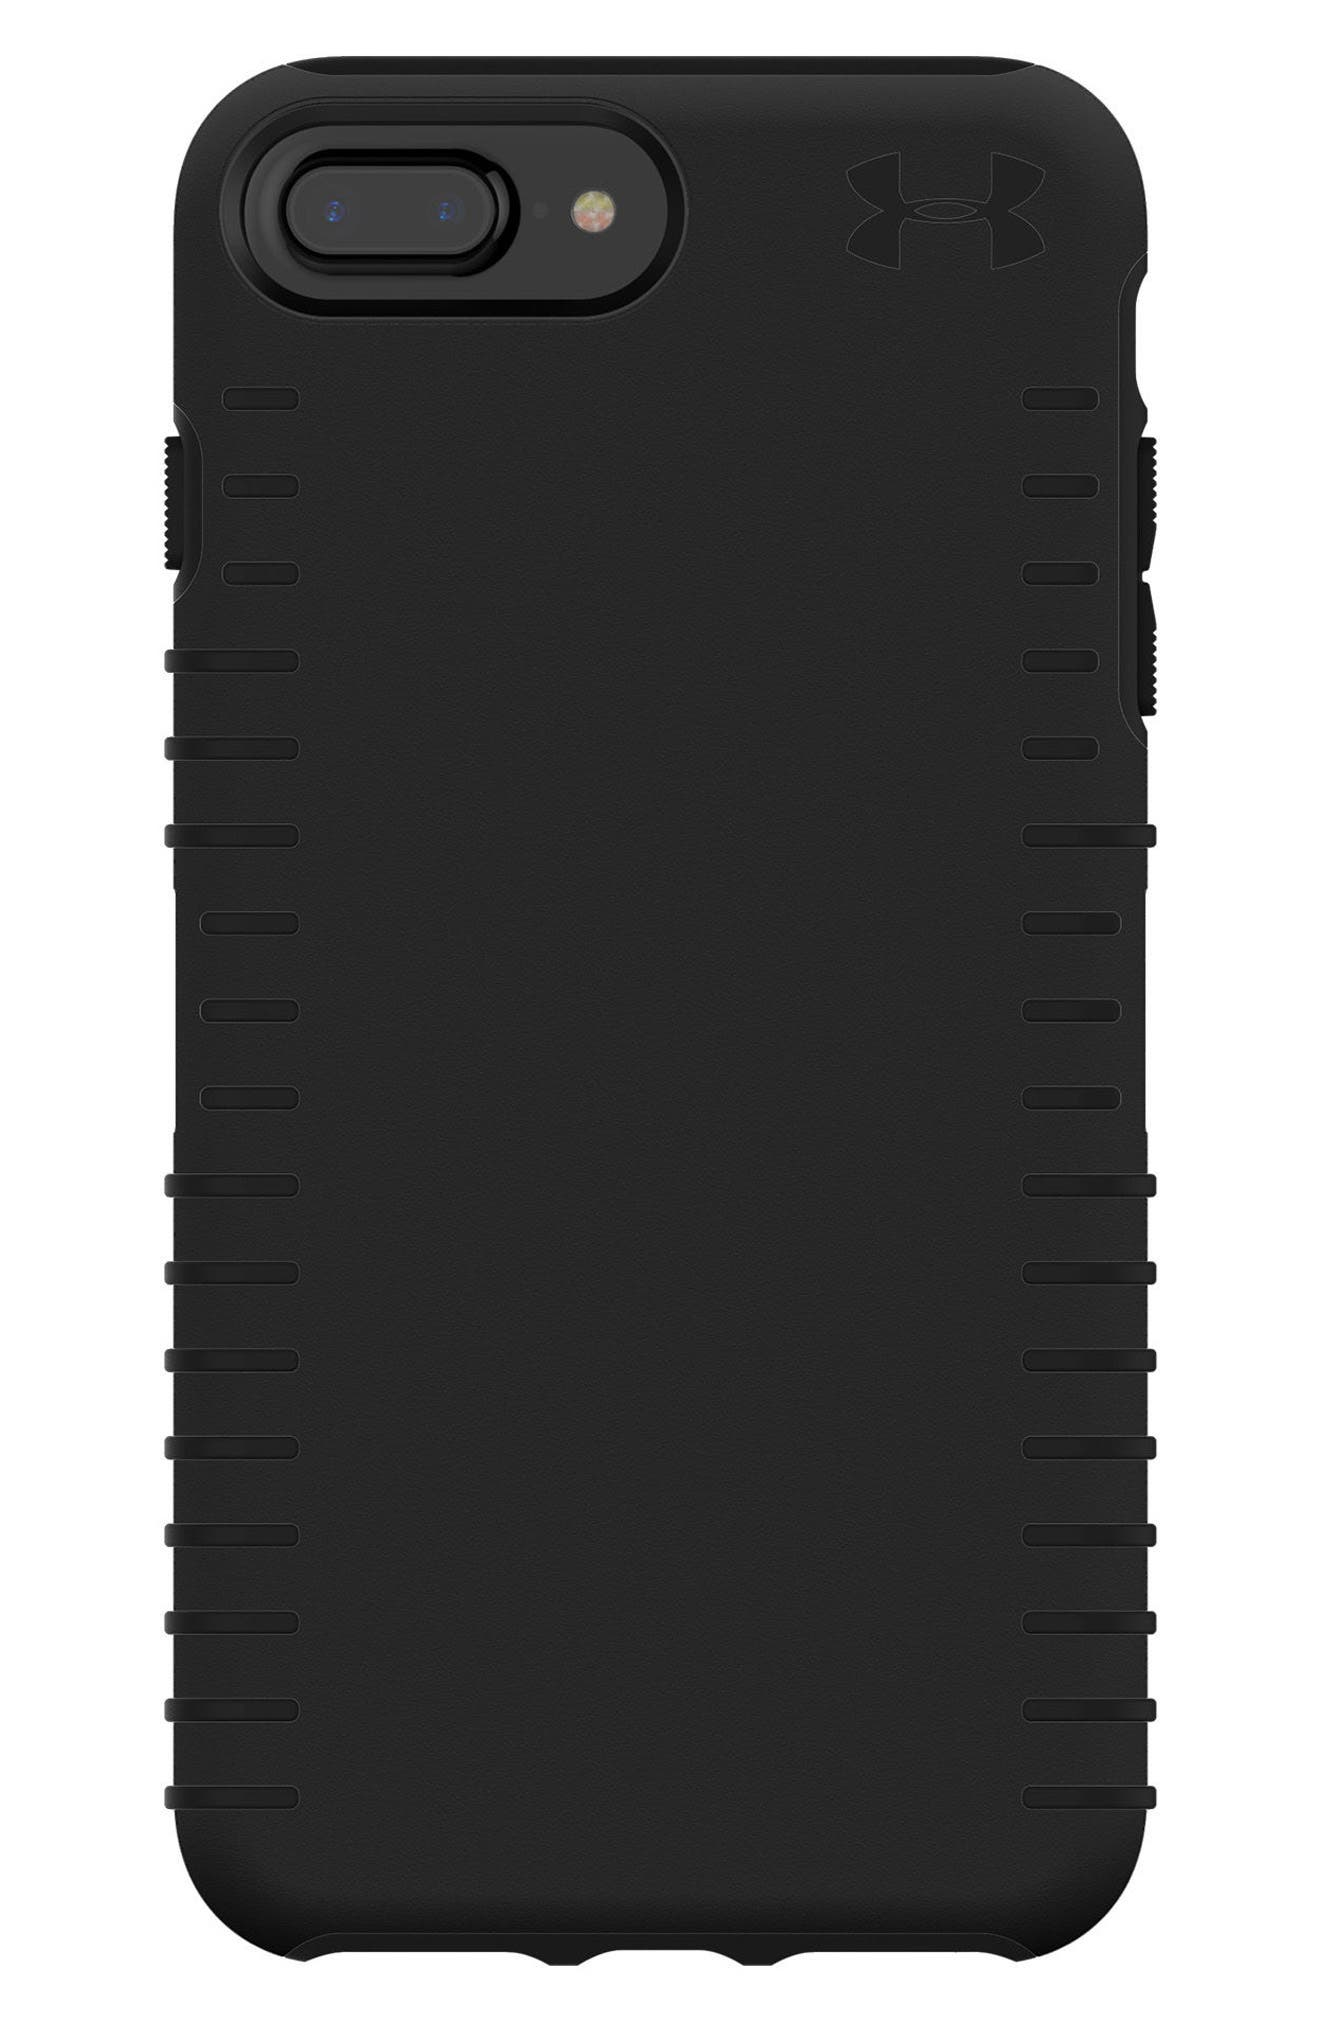 Protect Grip iPhone 6/6s/7/8 Plus Case,                         Main,                         color, 001